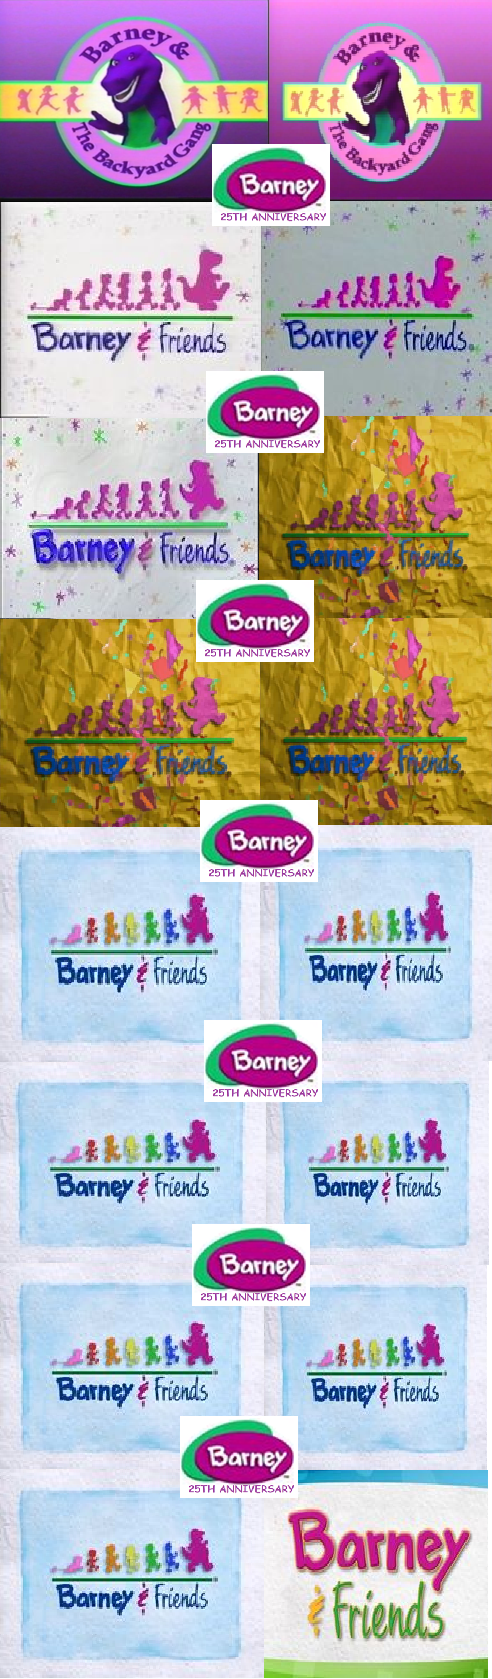 Barneys Th Anniversary Barney The Backyard Gang And Barney - Barney backyard gang concert vhs